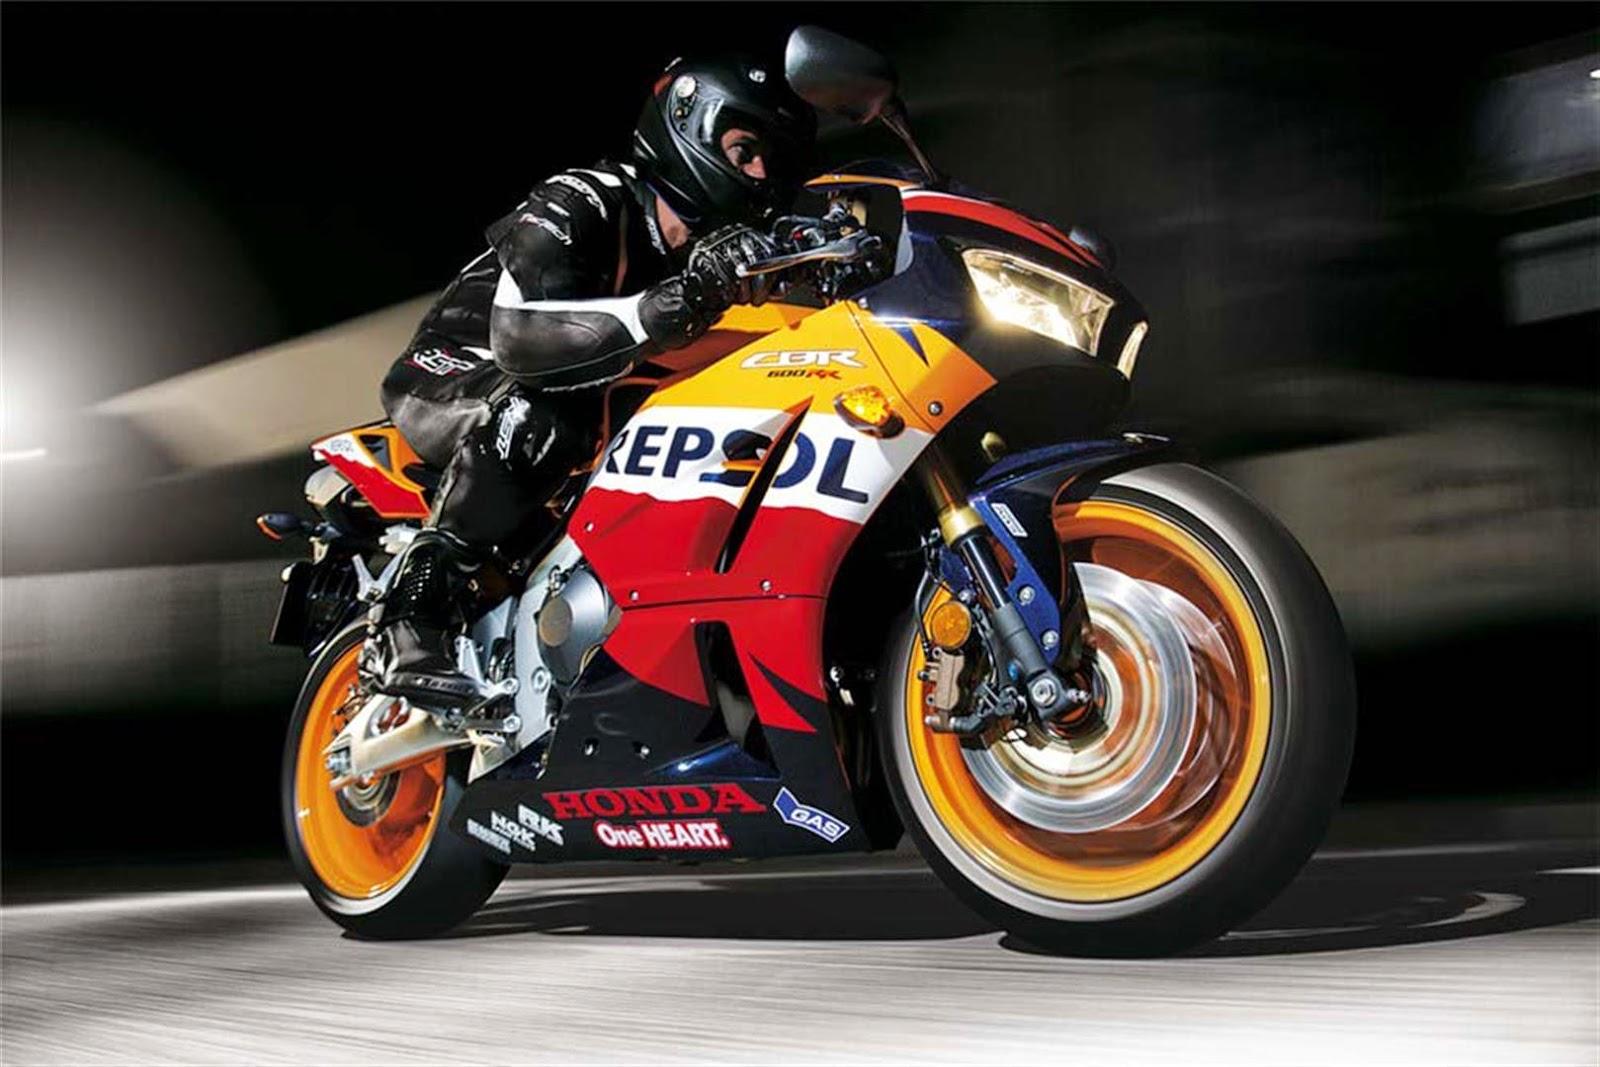 Honda CBR1000RR Repsol Bikes Photos